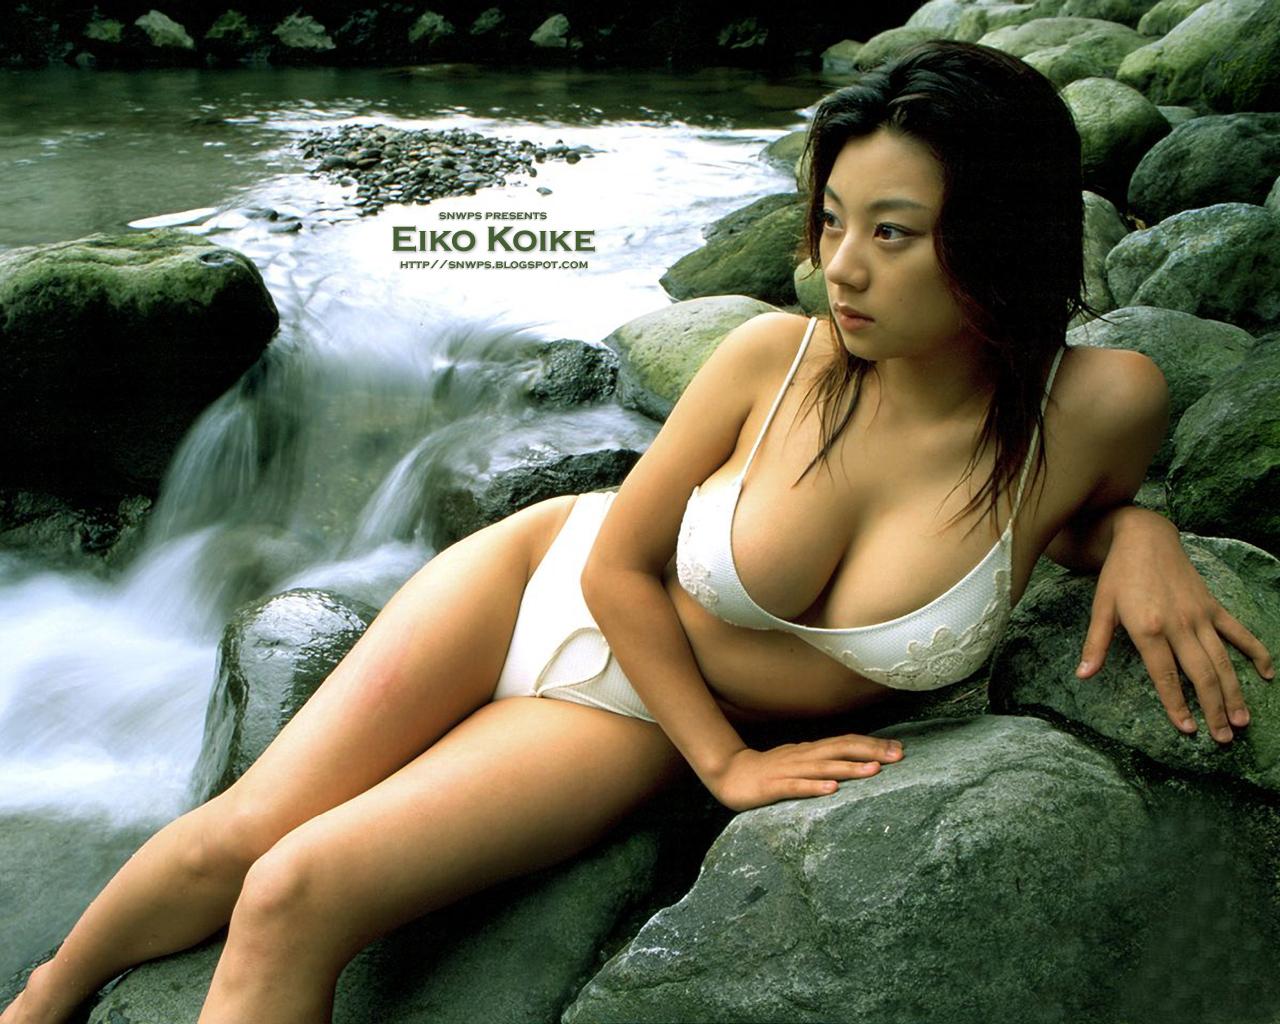 Les membres en image Eiko_Koike_001